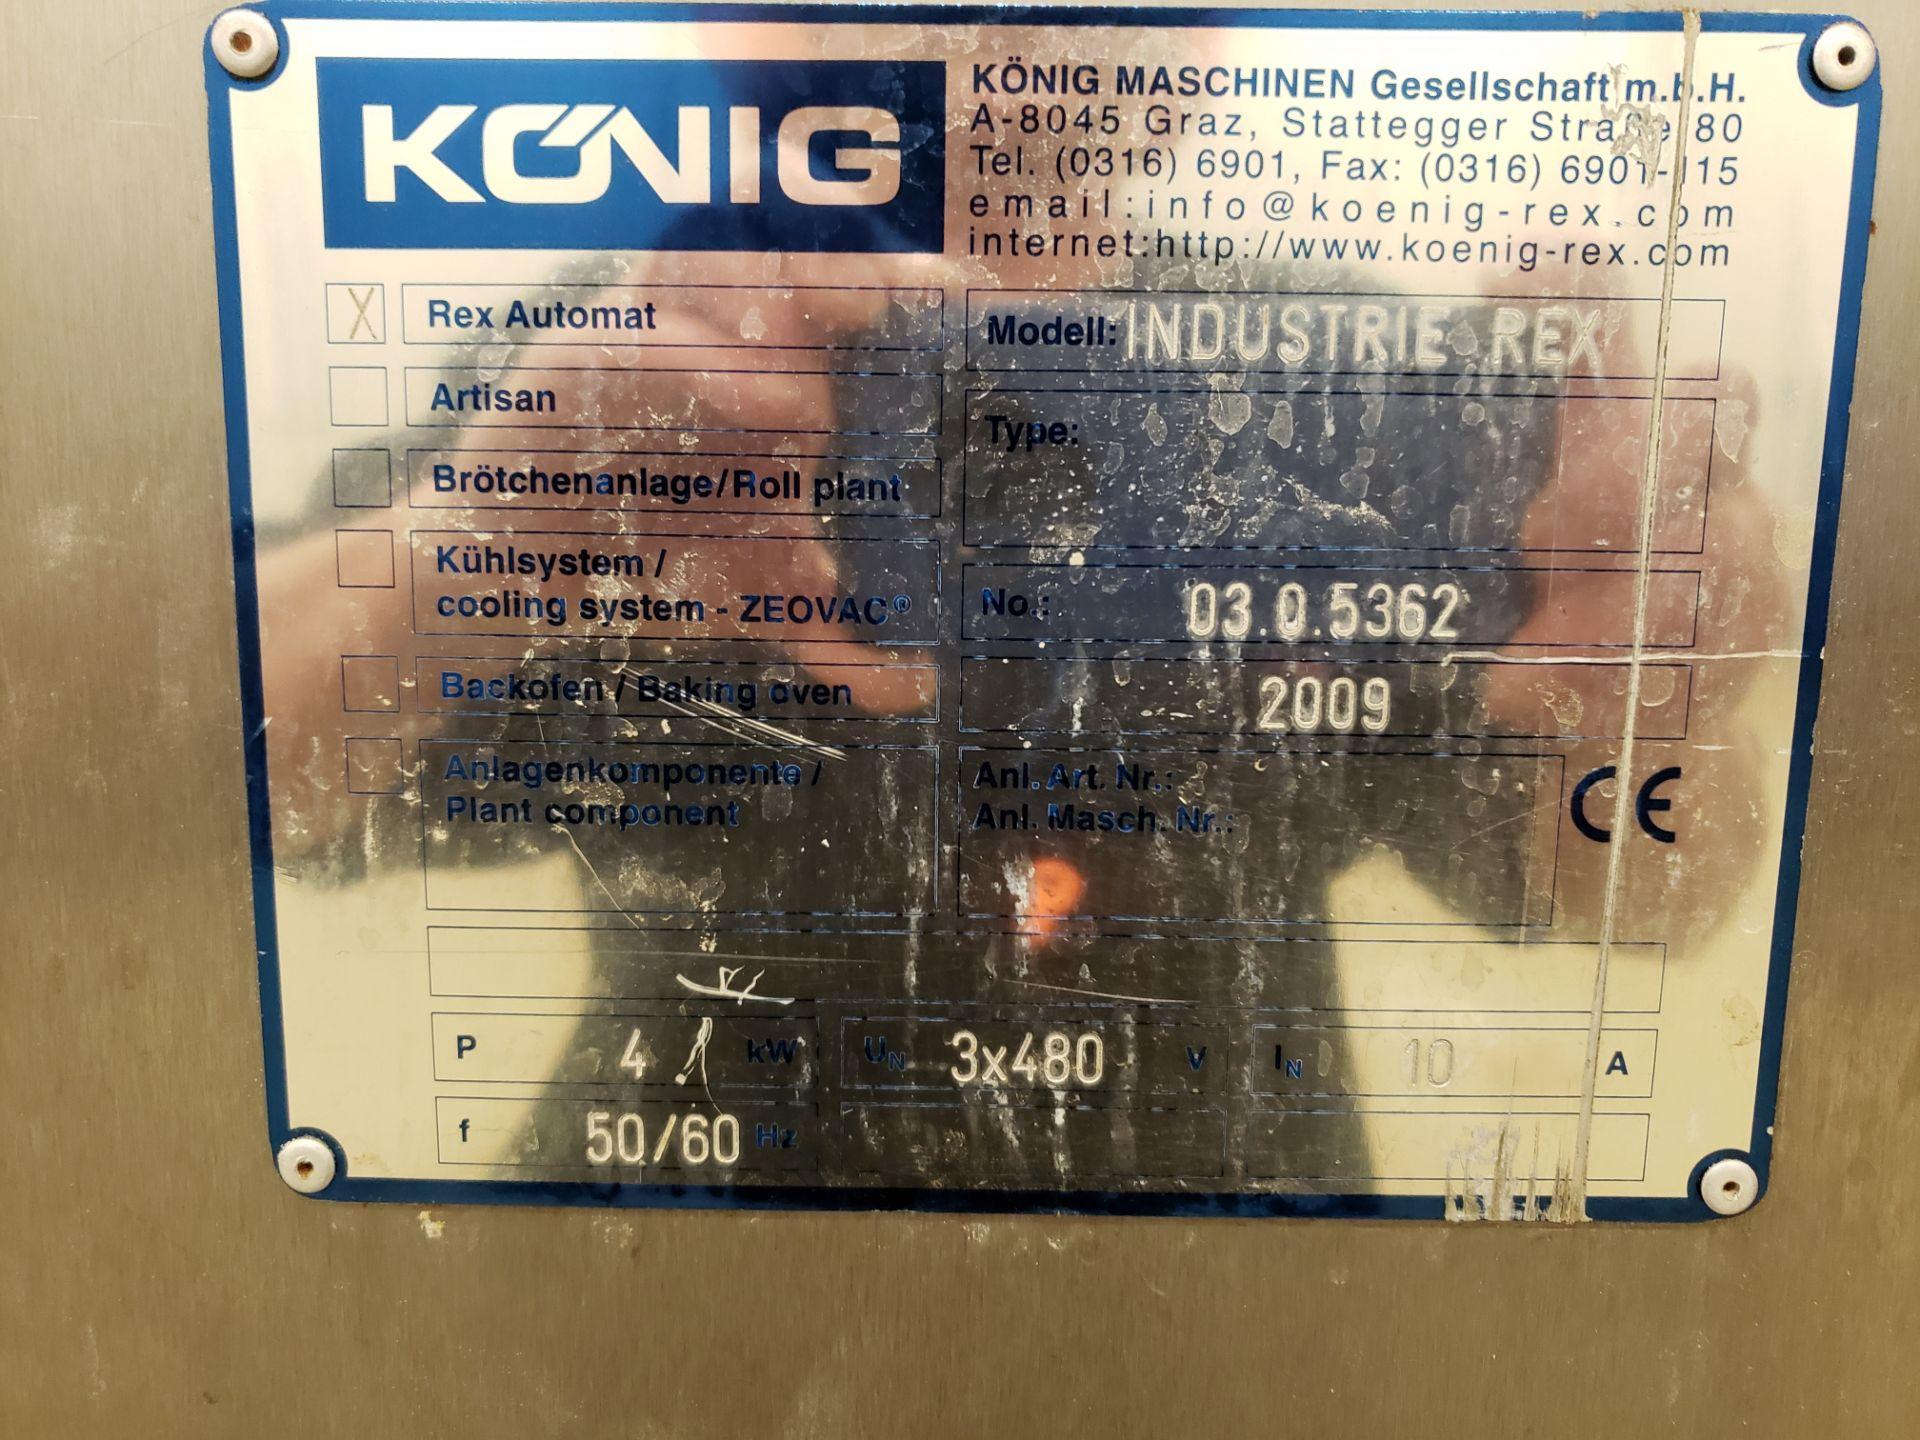 "Lot 11 - 2009 Konig Divider/Rounder, M# Industrie Rex TRO500, Type TBT, S/N 923690, (10) 3"" | Rig Fee: $1400"